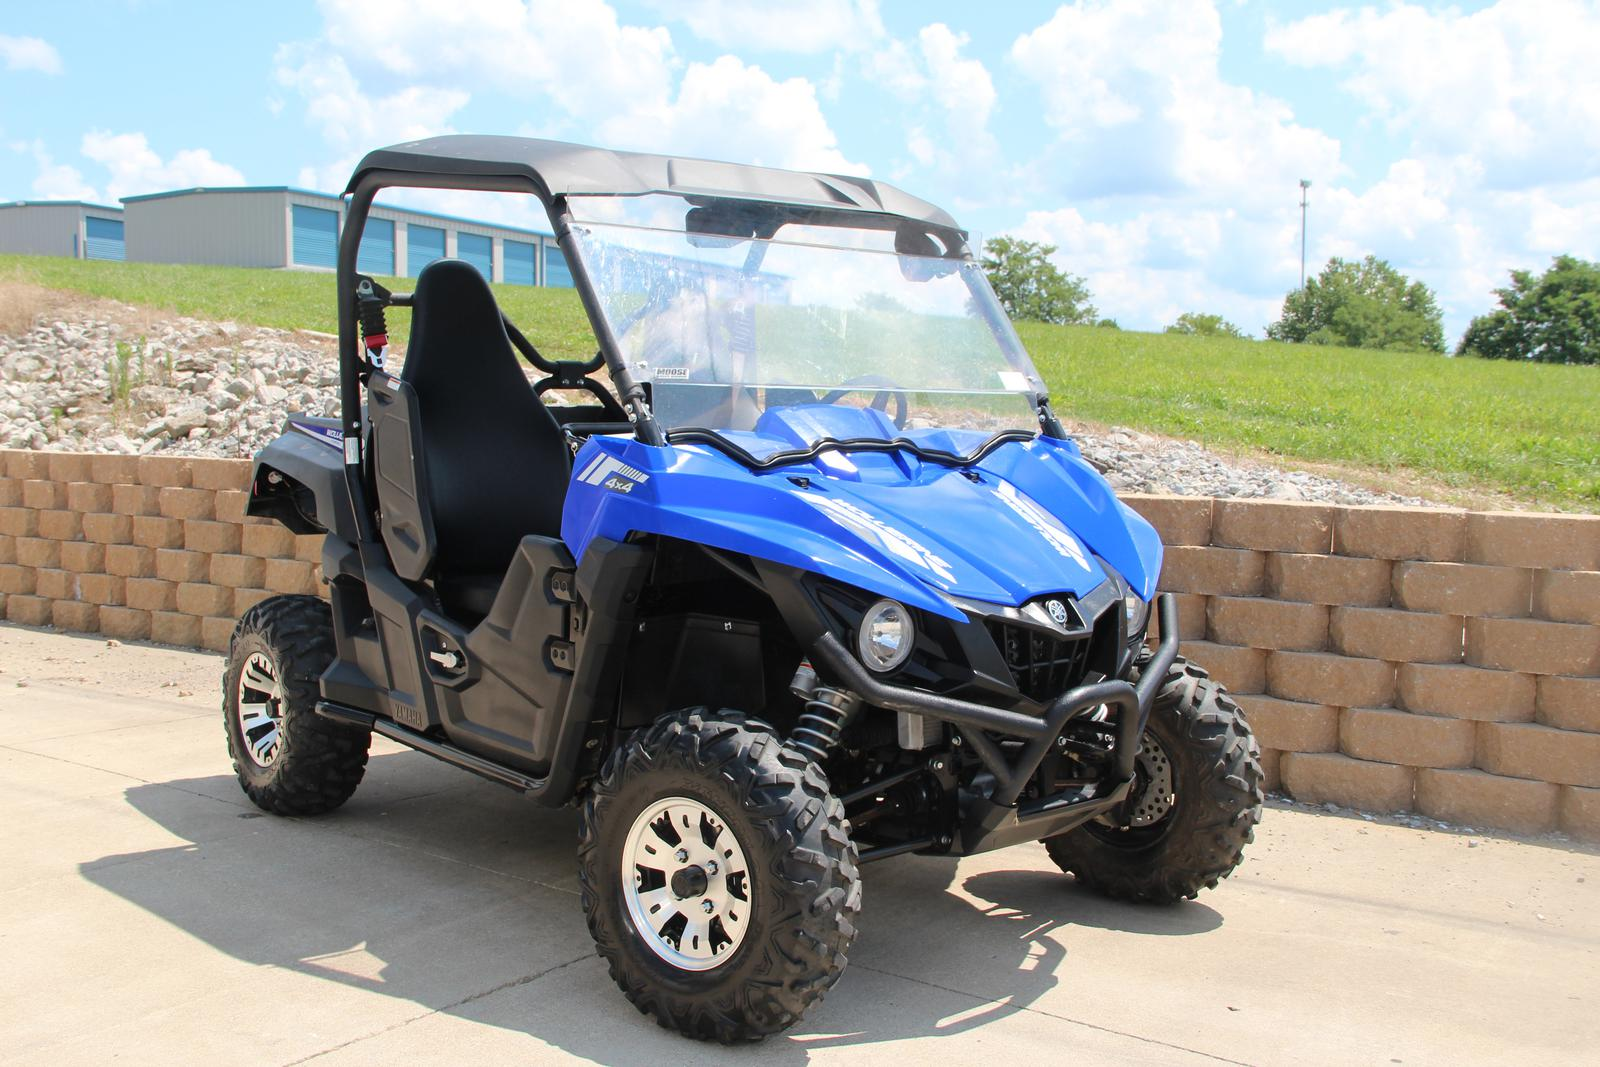 Inventory Big Blue Outdoor Inc  Flemingsburg, KY 1 (866) 471-2887